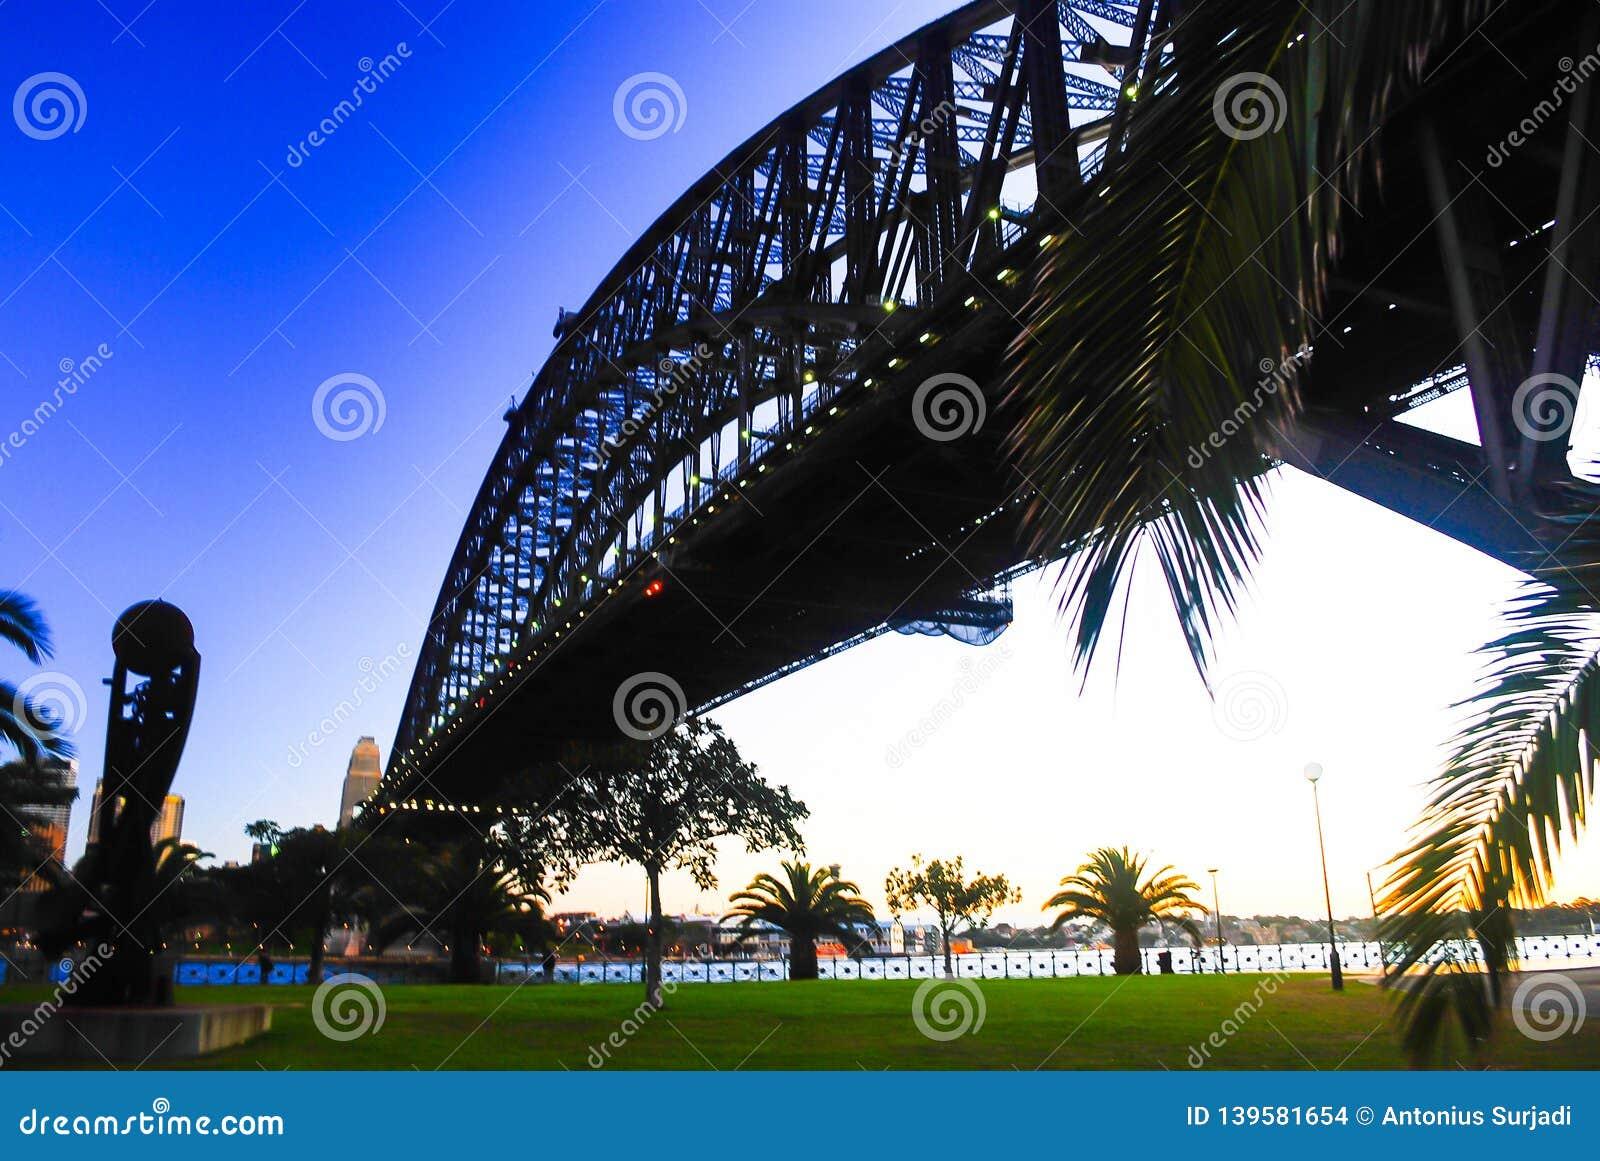 Mighty steel Sydney Harbor bridge crossing the ocean